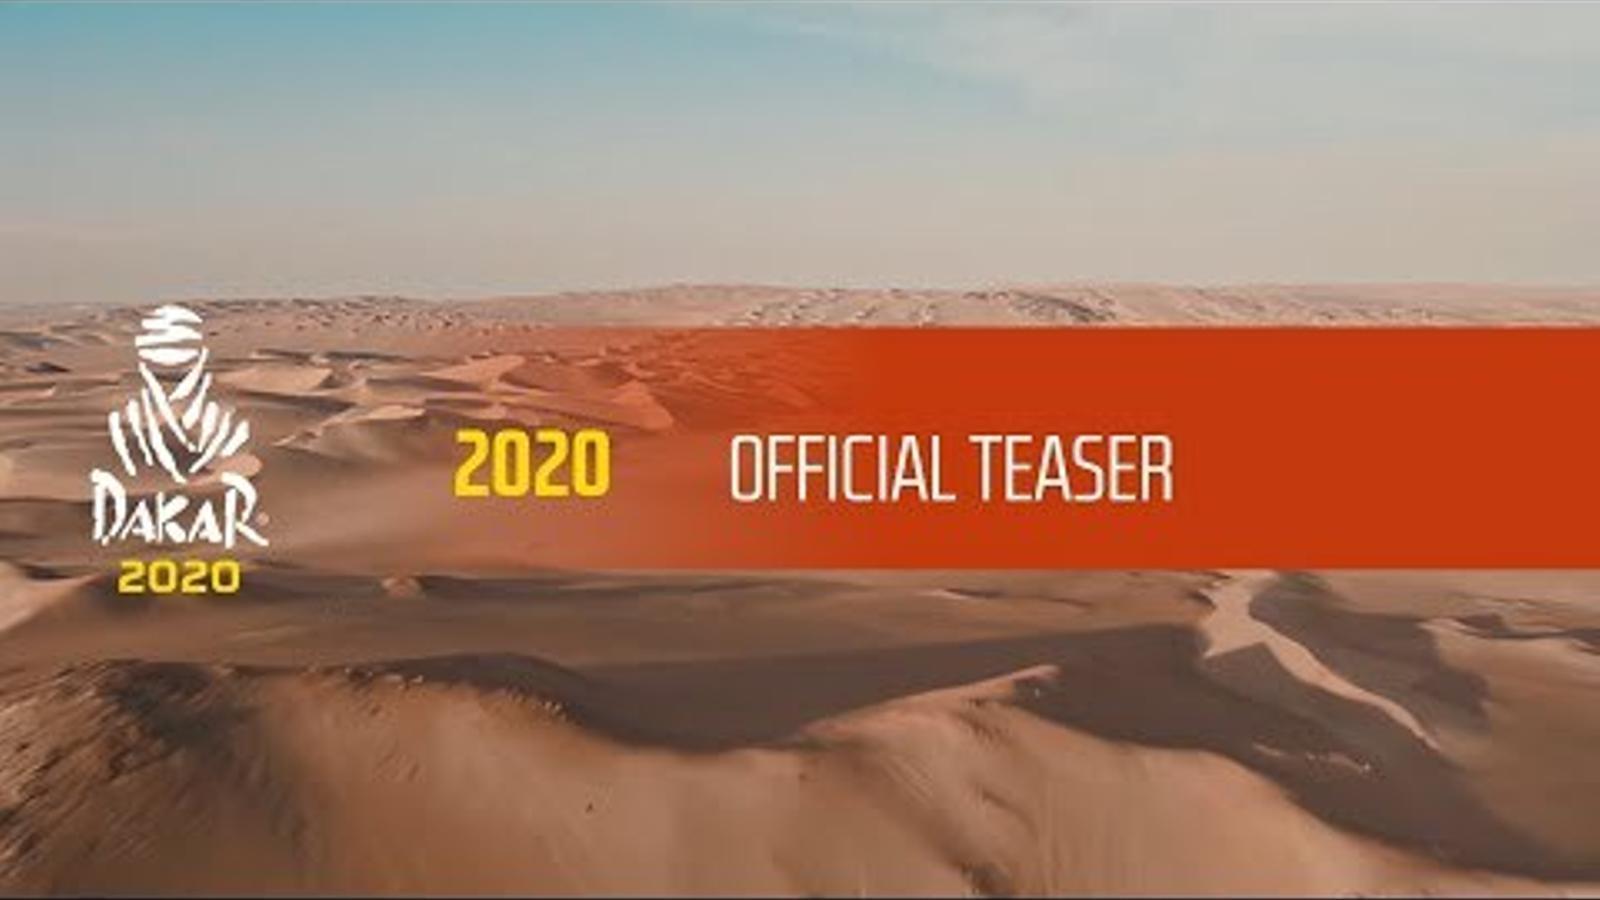 Així serà el Dakar 2020 a l'Aràbia Saudita